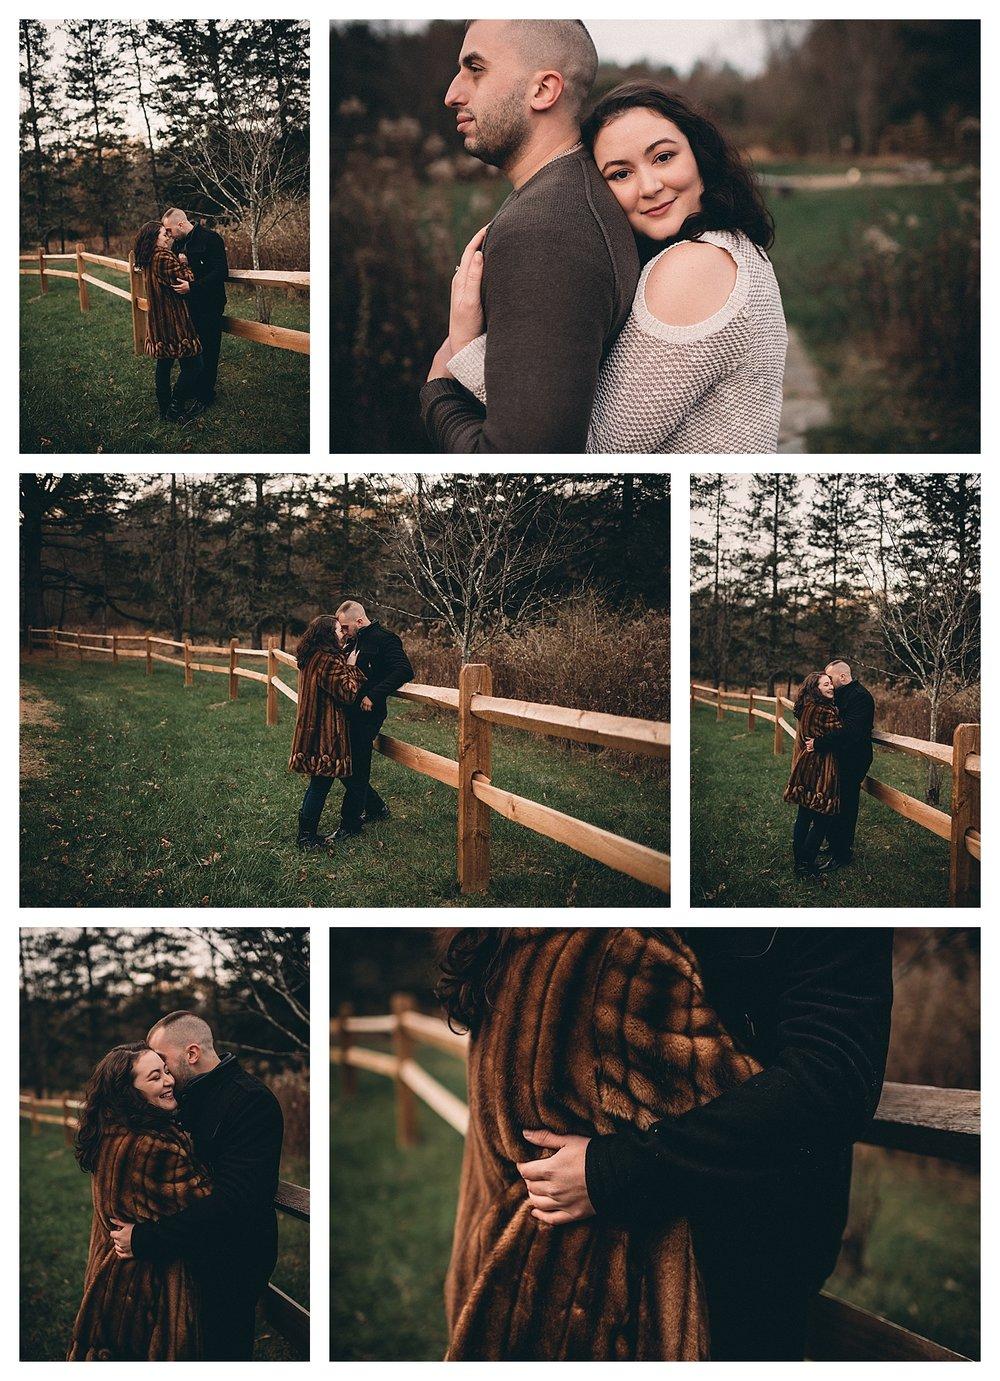 NEPA-Scranton-wedding-engagement-photographer-in-Philadelphia-PA-Central-PA_0313.jpg